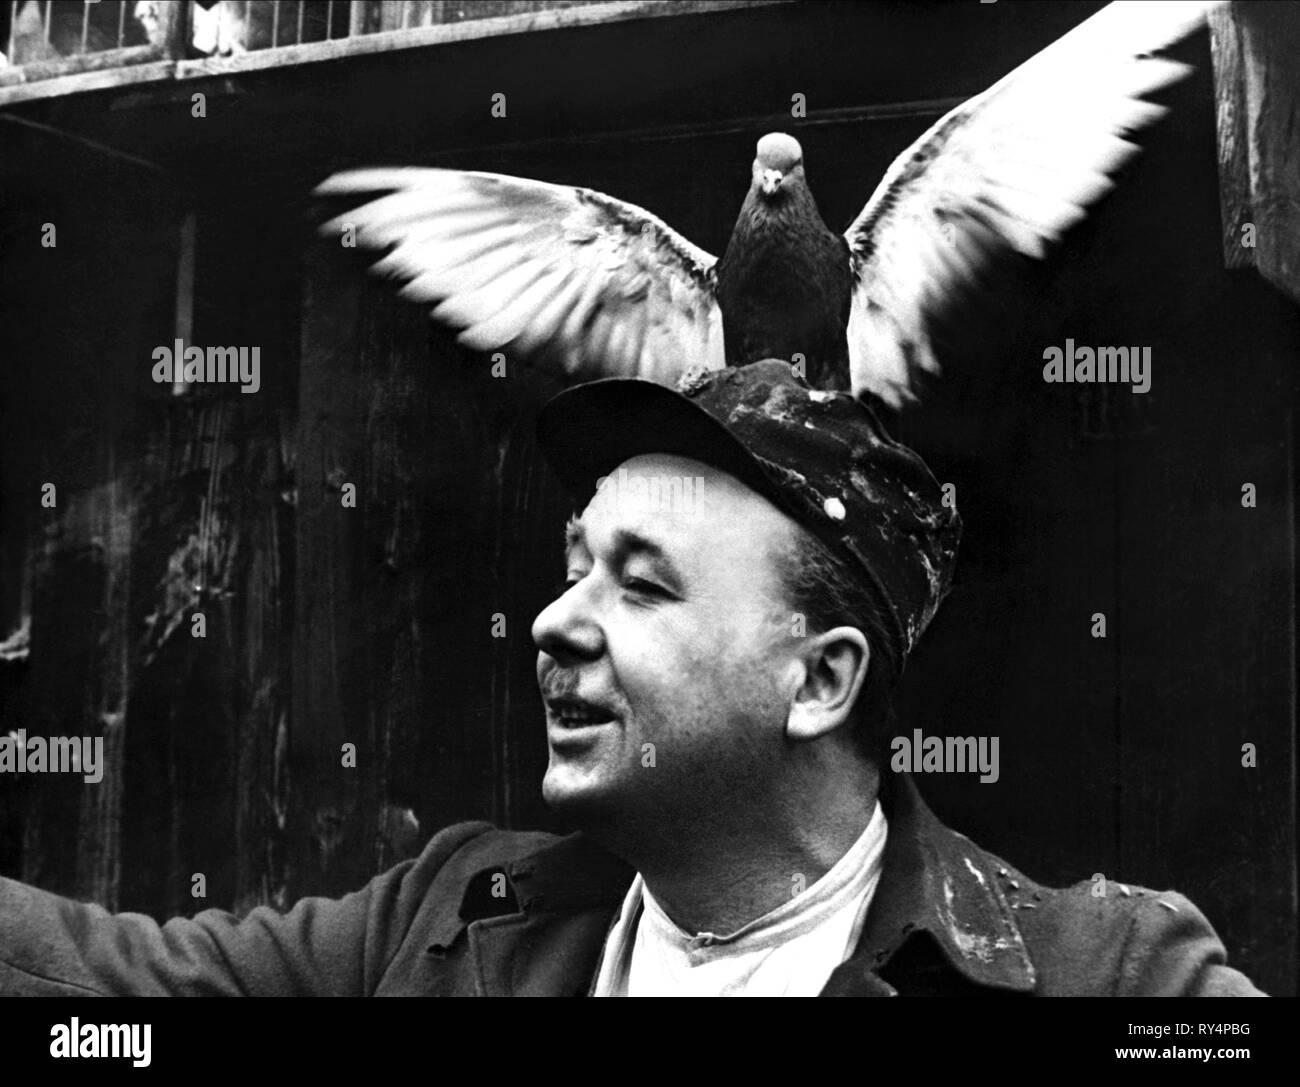 VLADIMIR VALENTA, CLOSELY OBSERVED TRAINS, 1966 - Stock Image